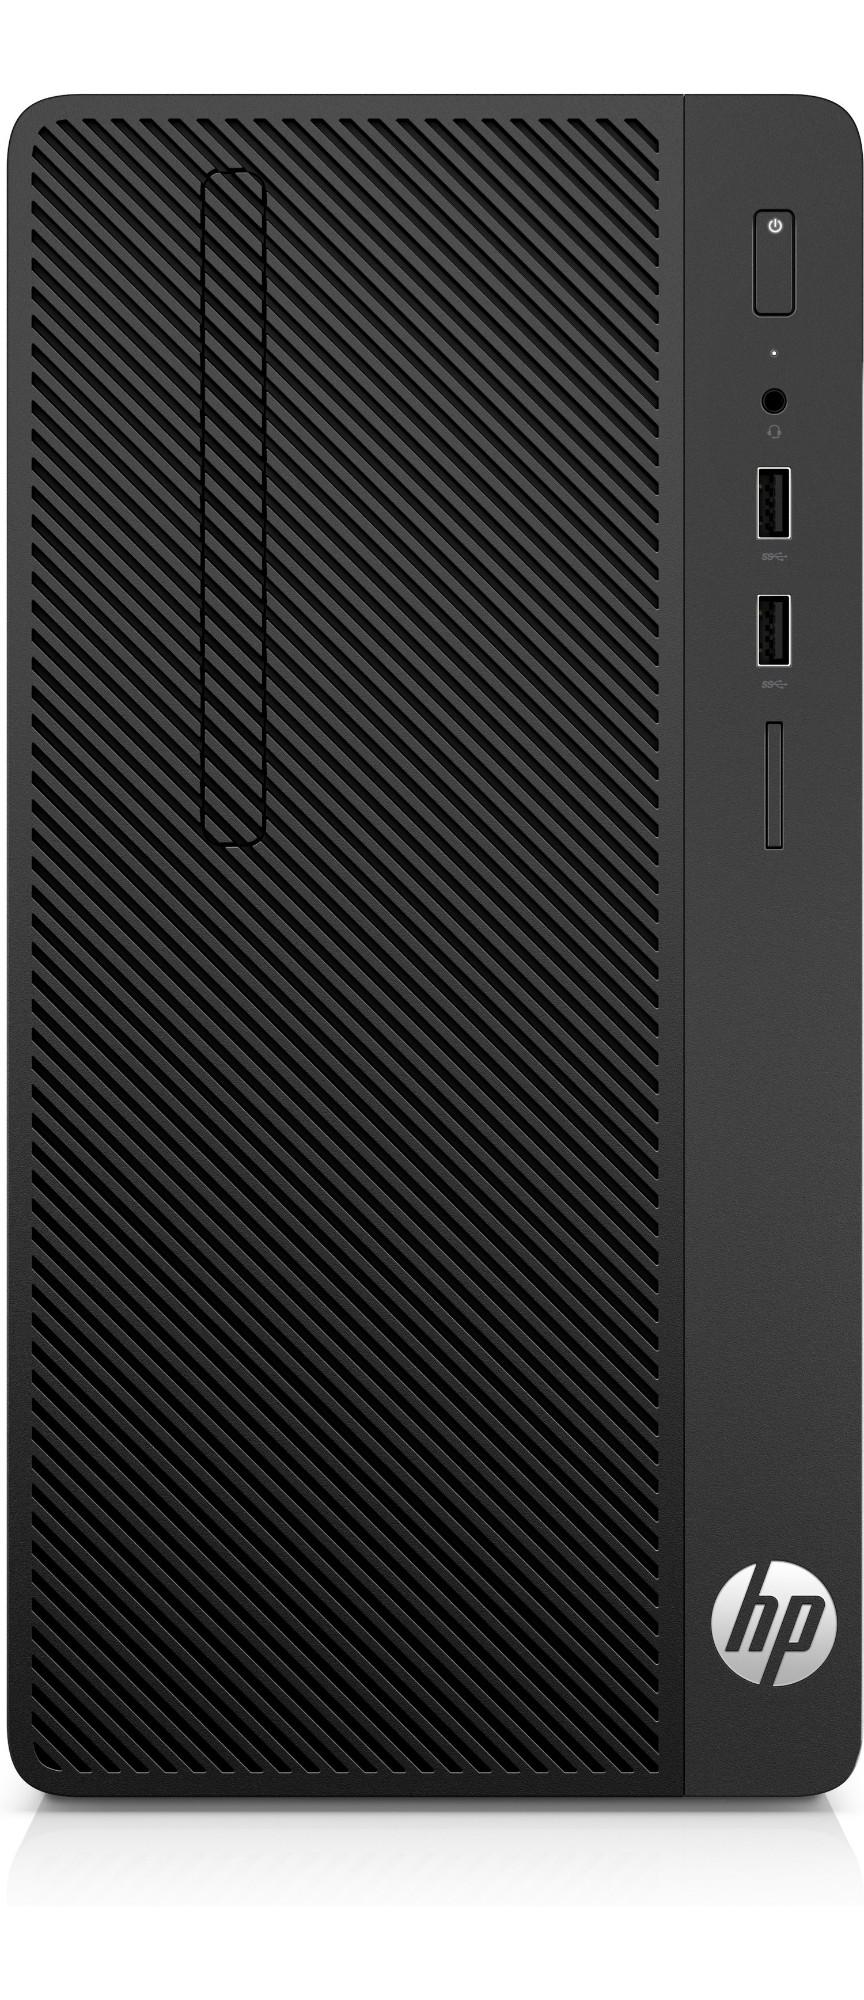 HP 285 G3 3 5 GHz AMD Ryzen 3 2200G Black Micro Tower PC